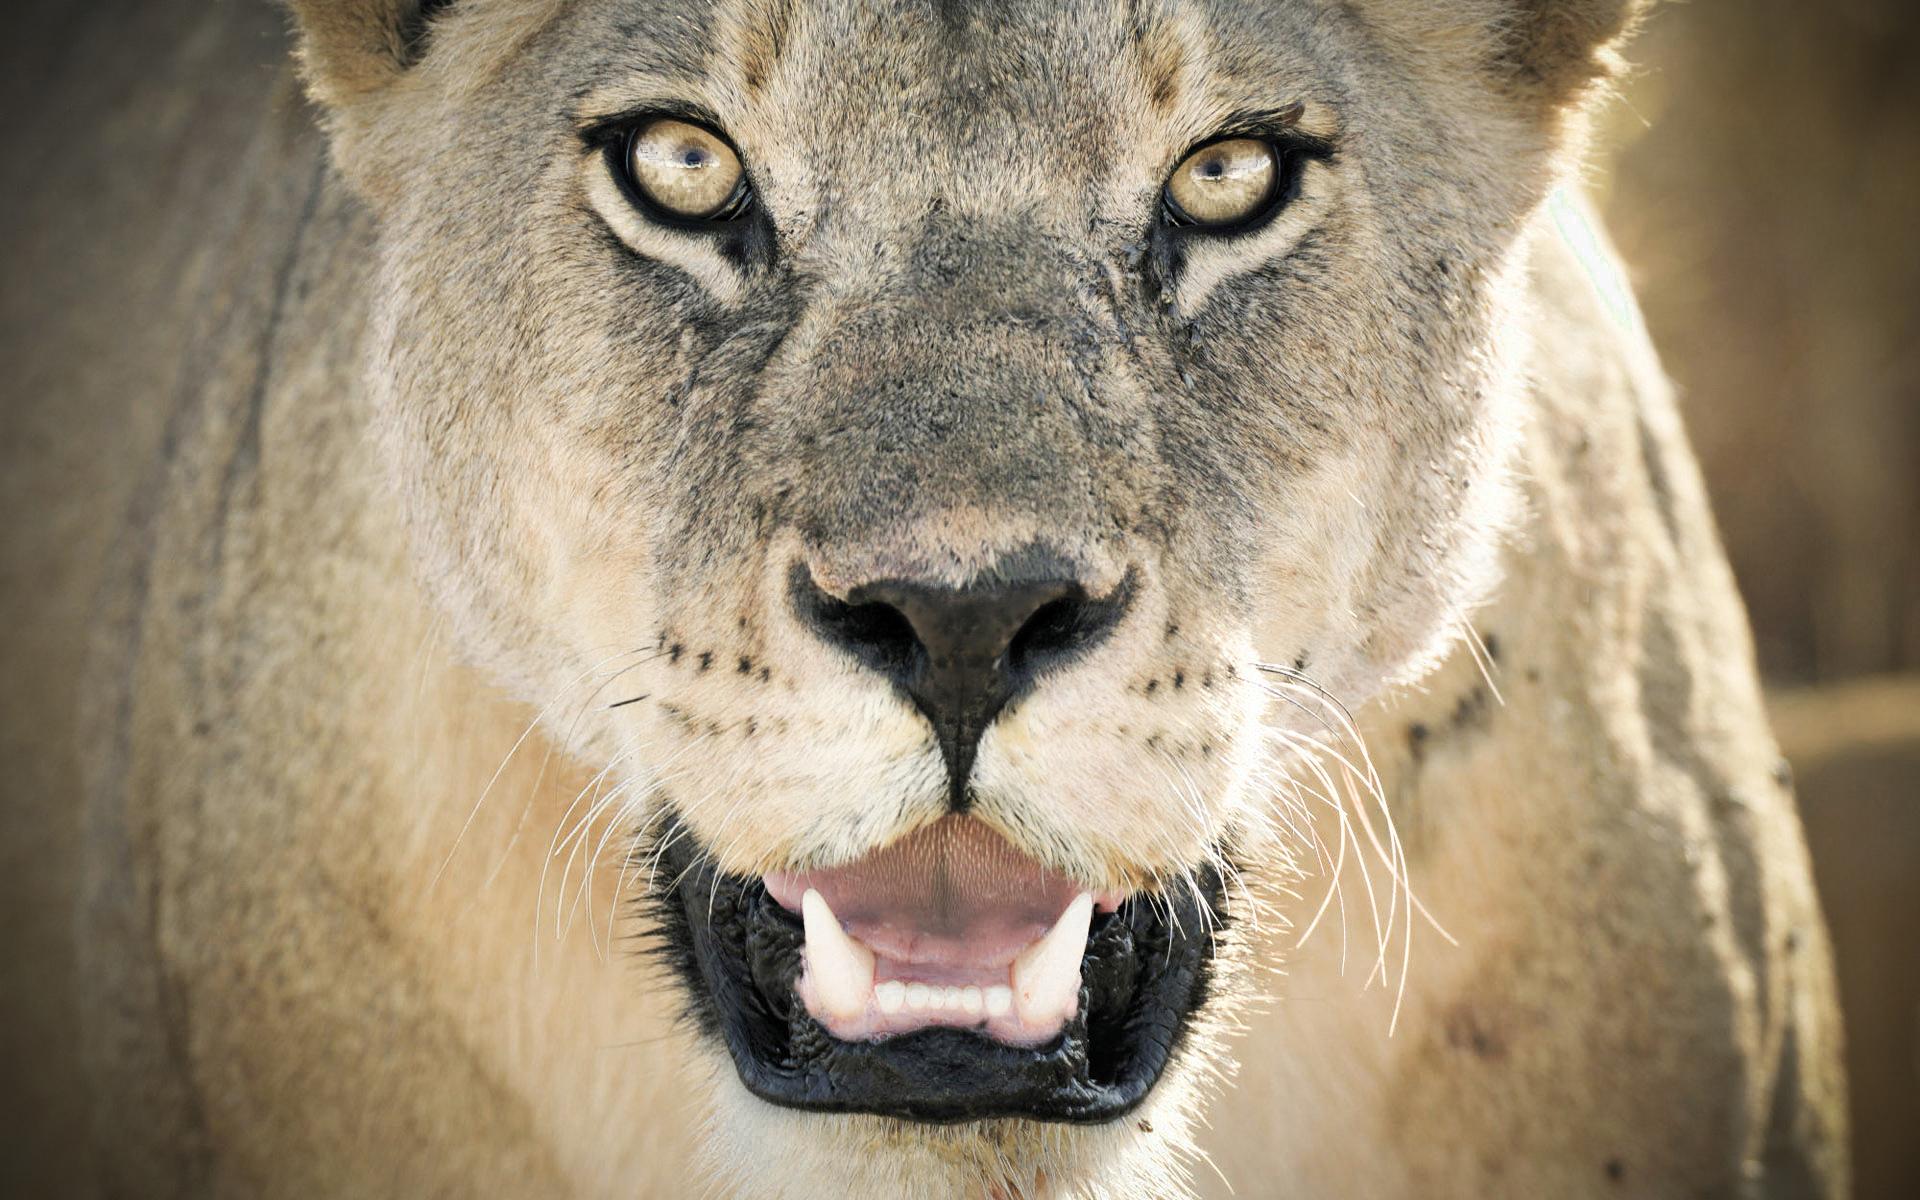 Lioness52068276 - Lioness - Lioness, Closeup